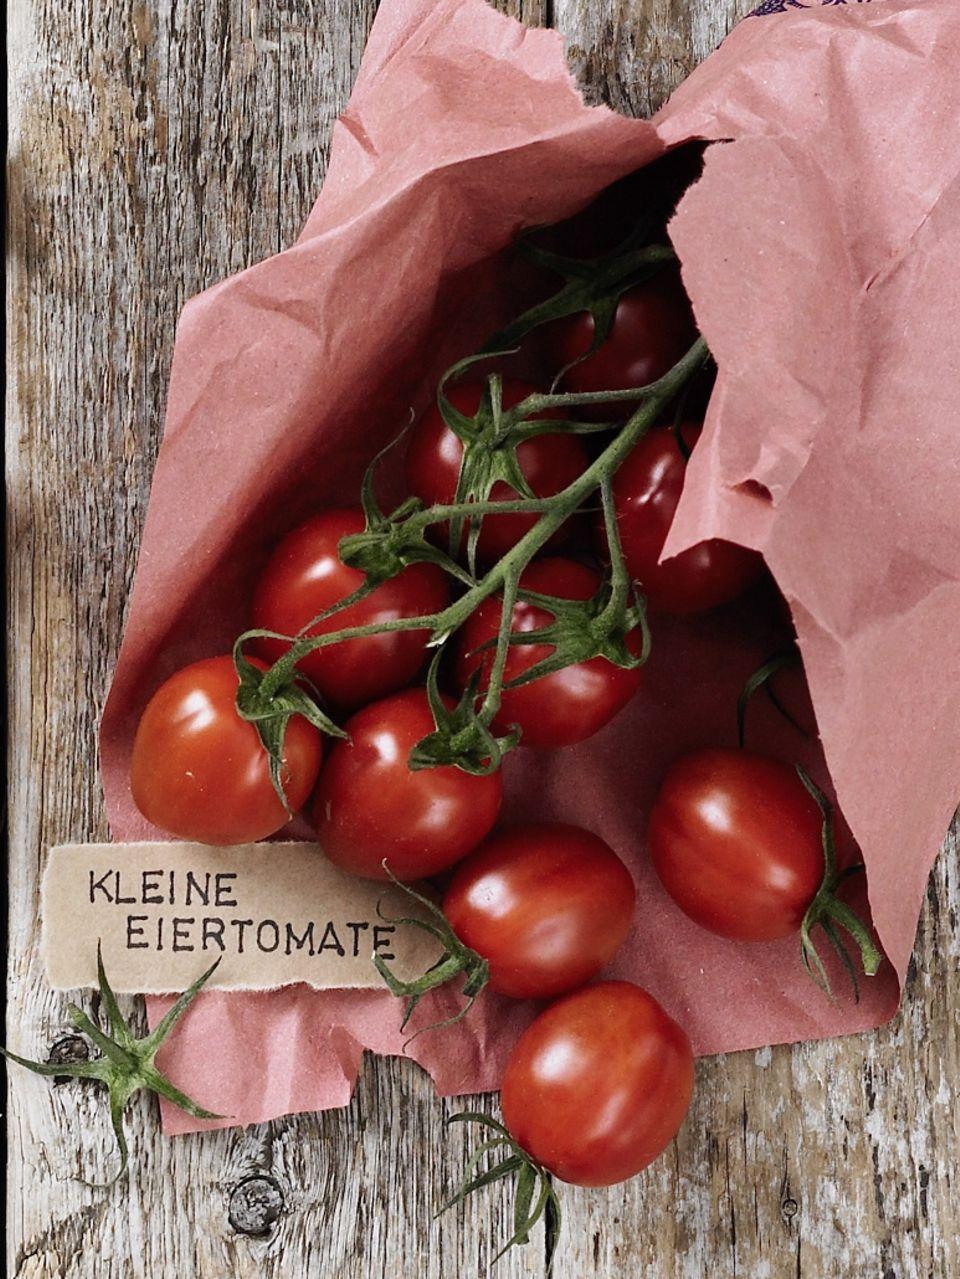 Tomatensorte Kleine Eiertomate